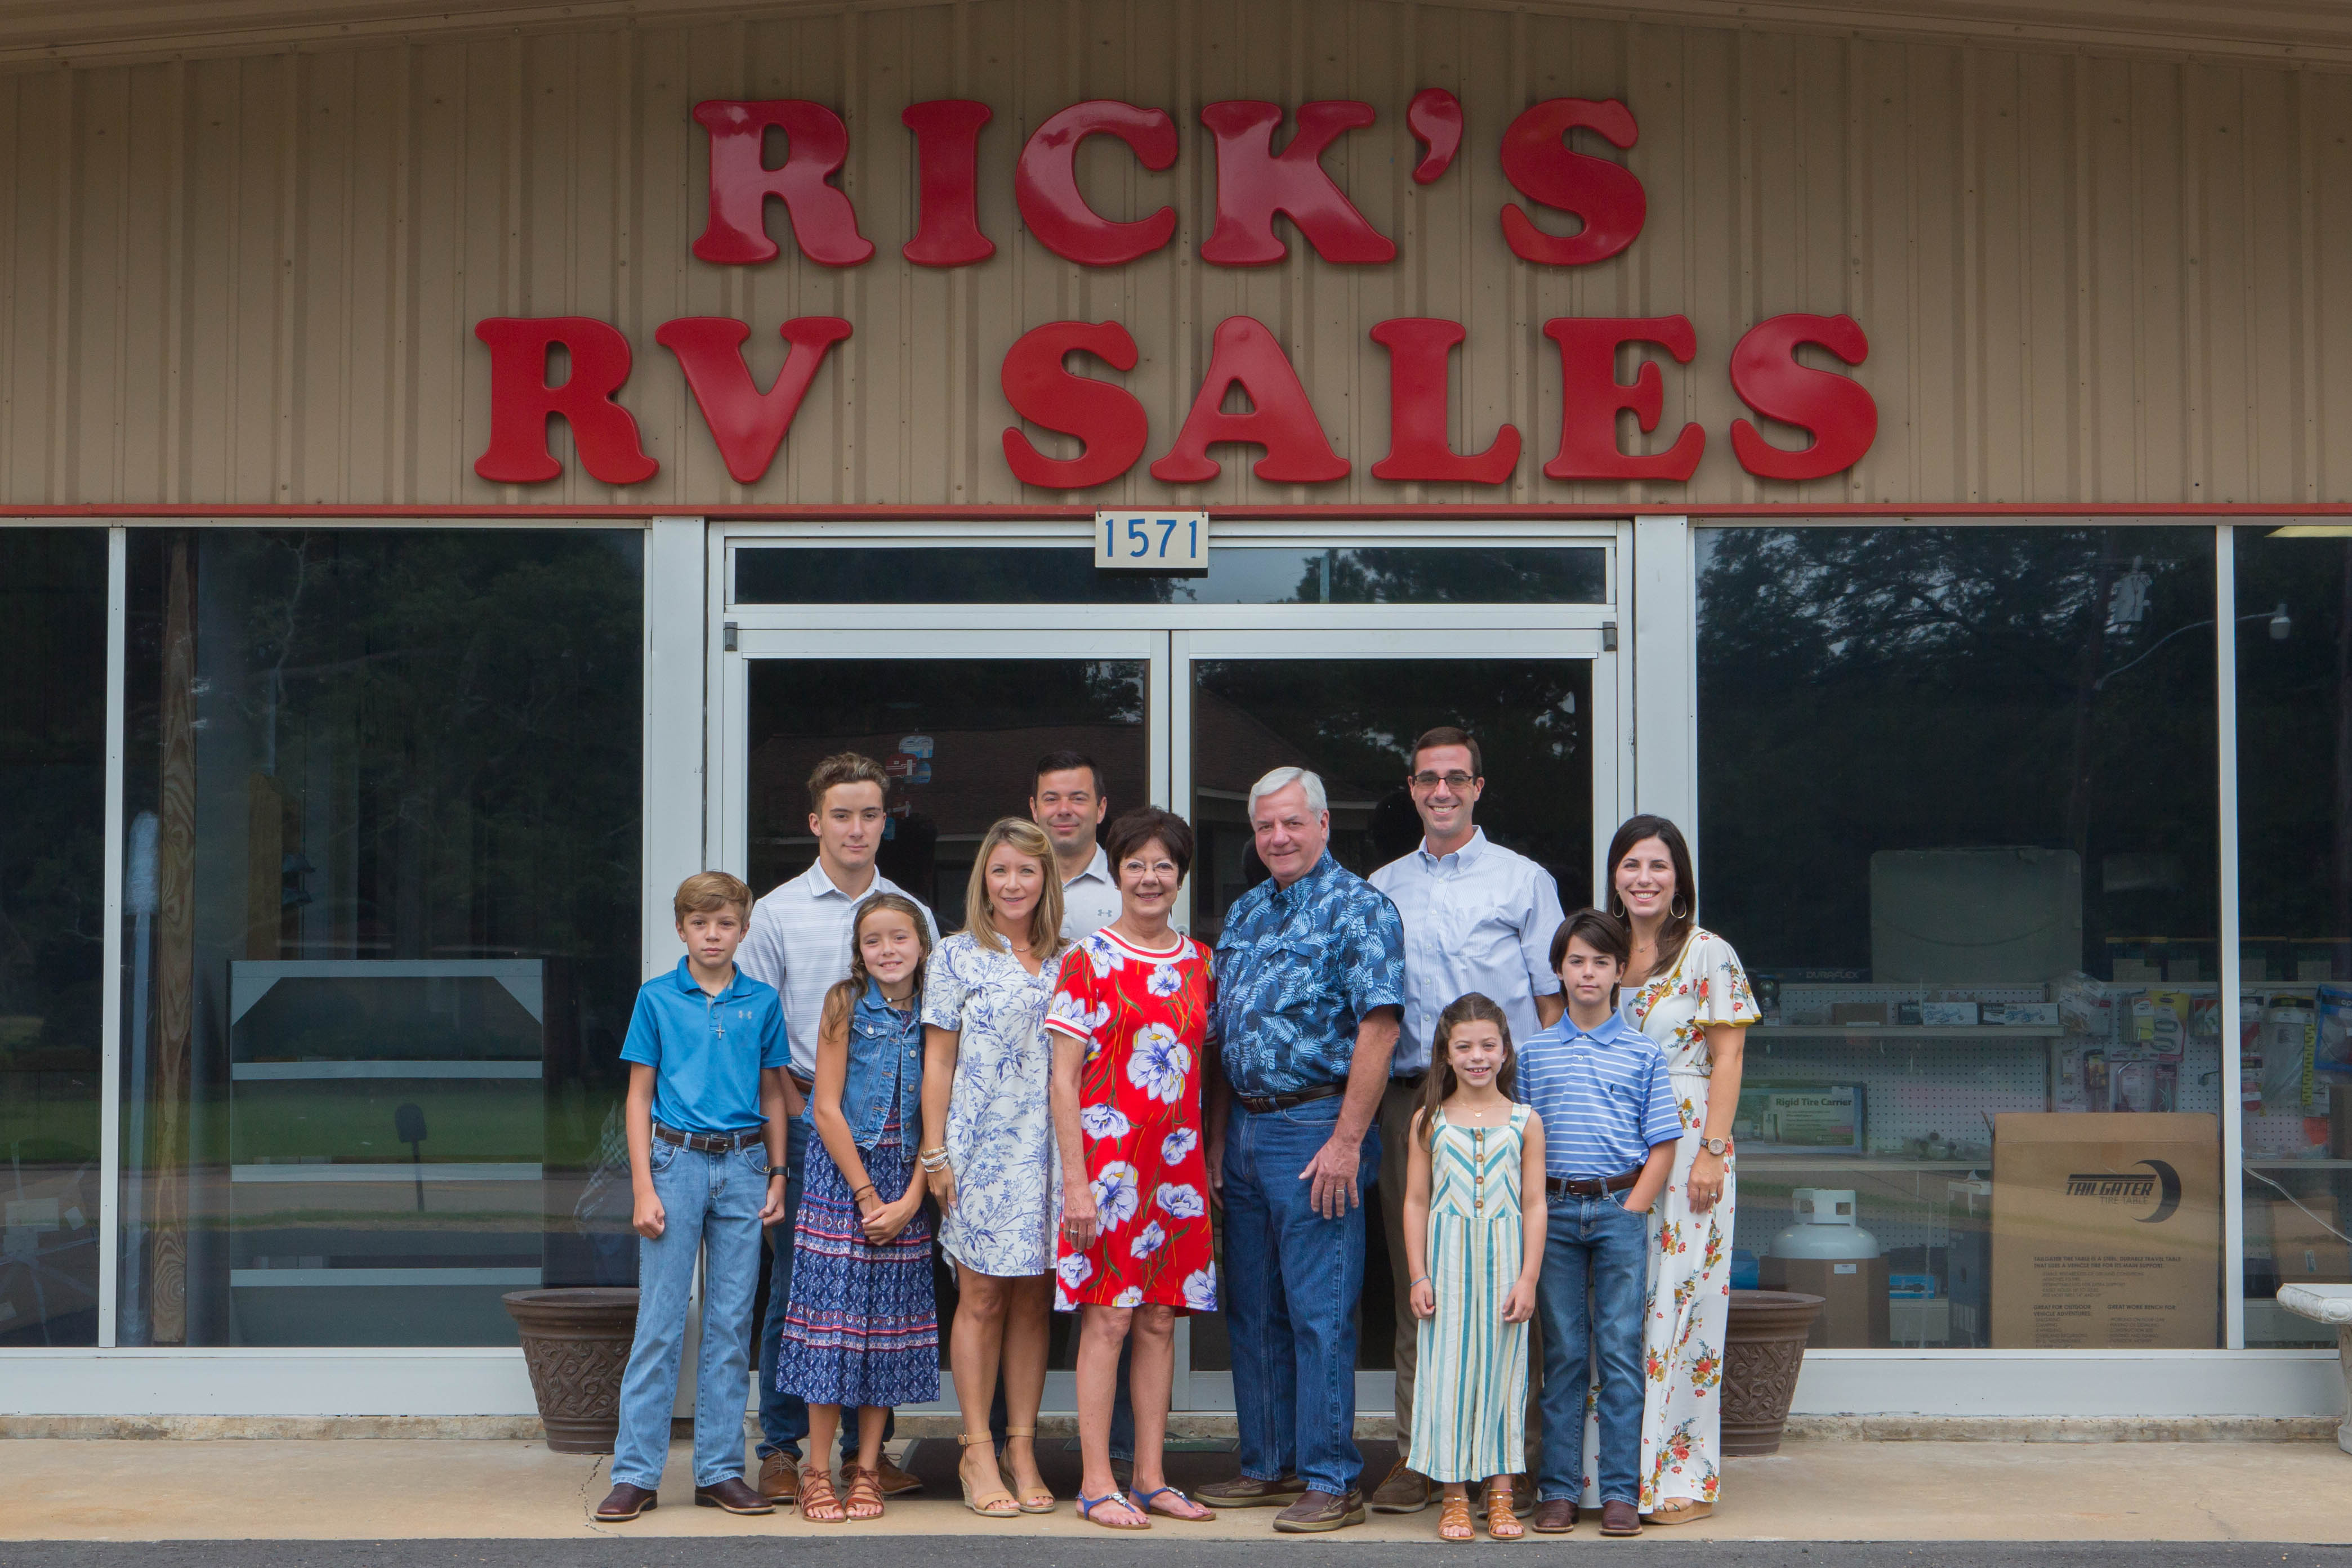 Johnson family photo at rick's rv sales in ville platte Louisiana.